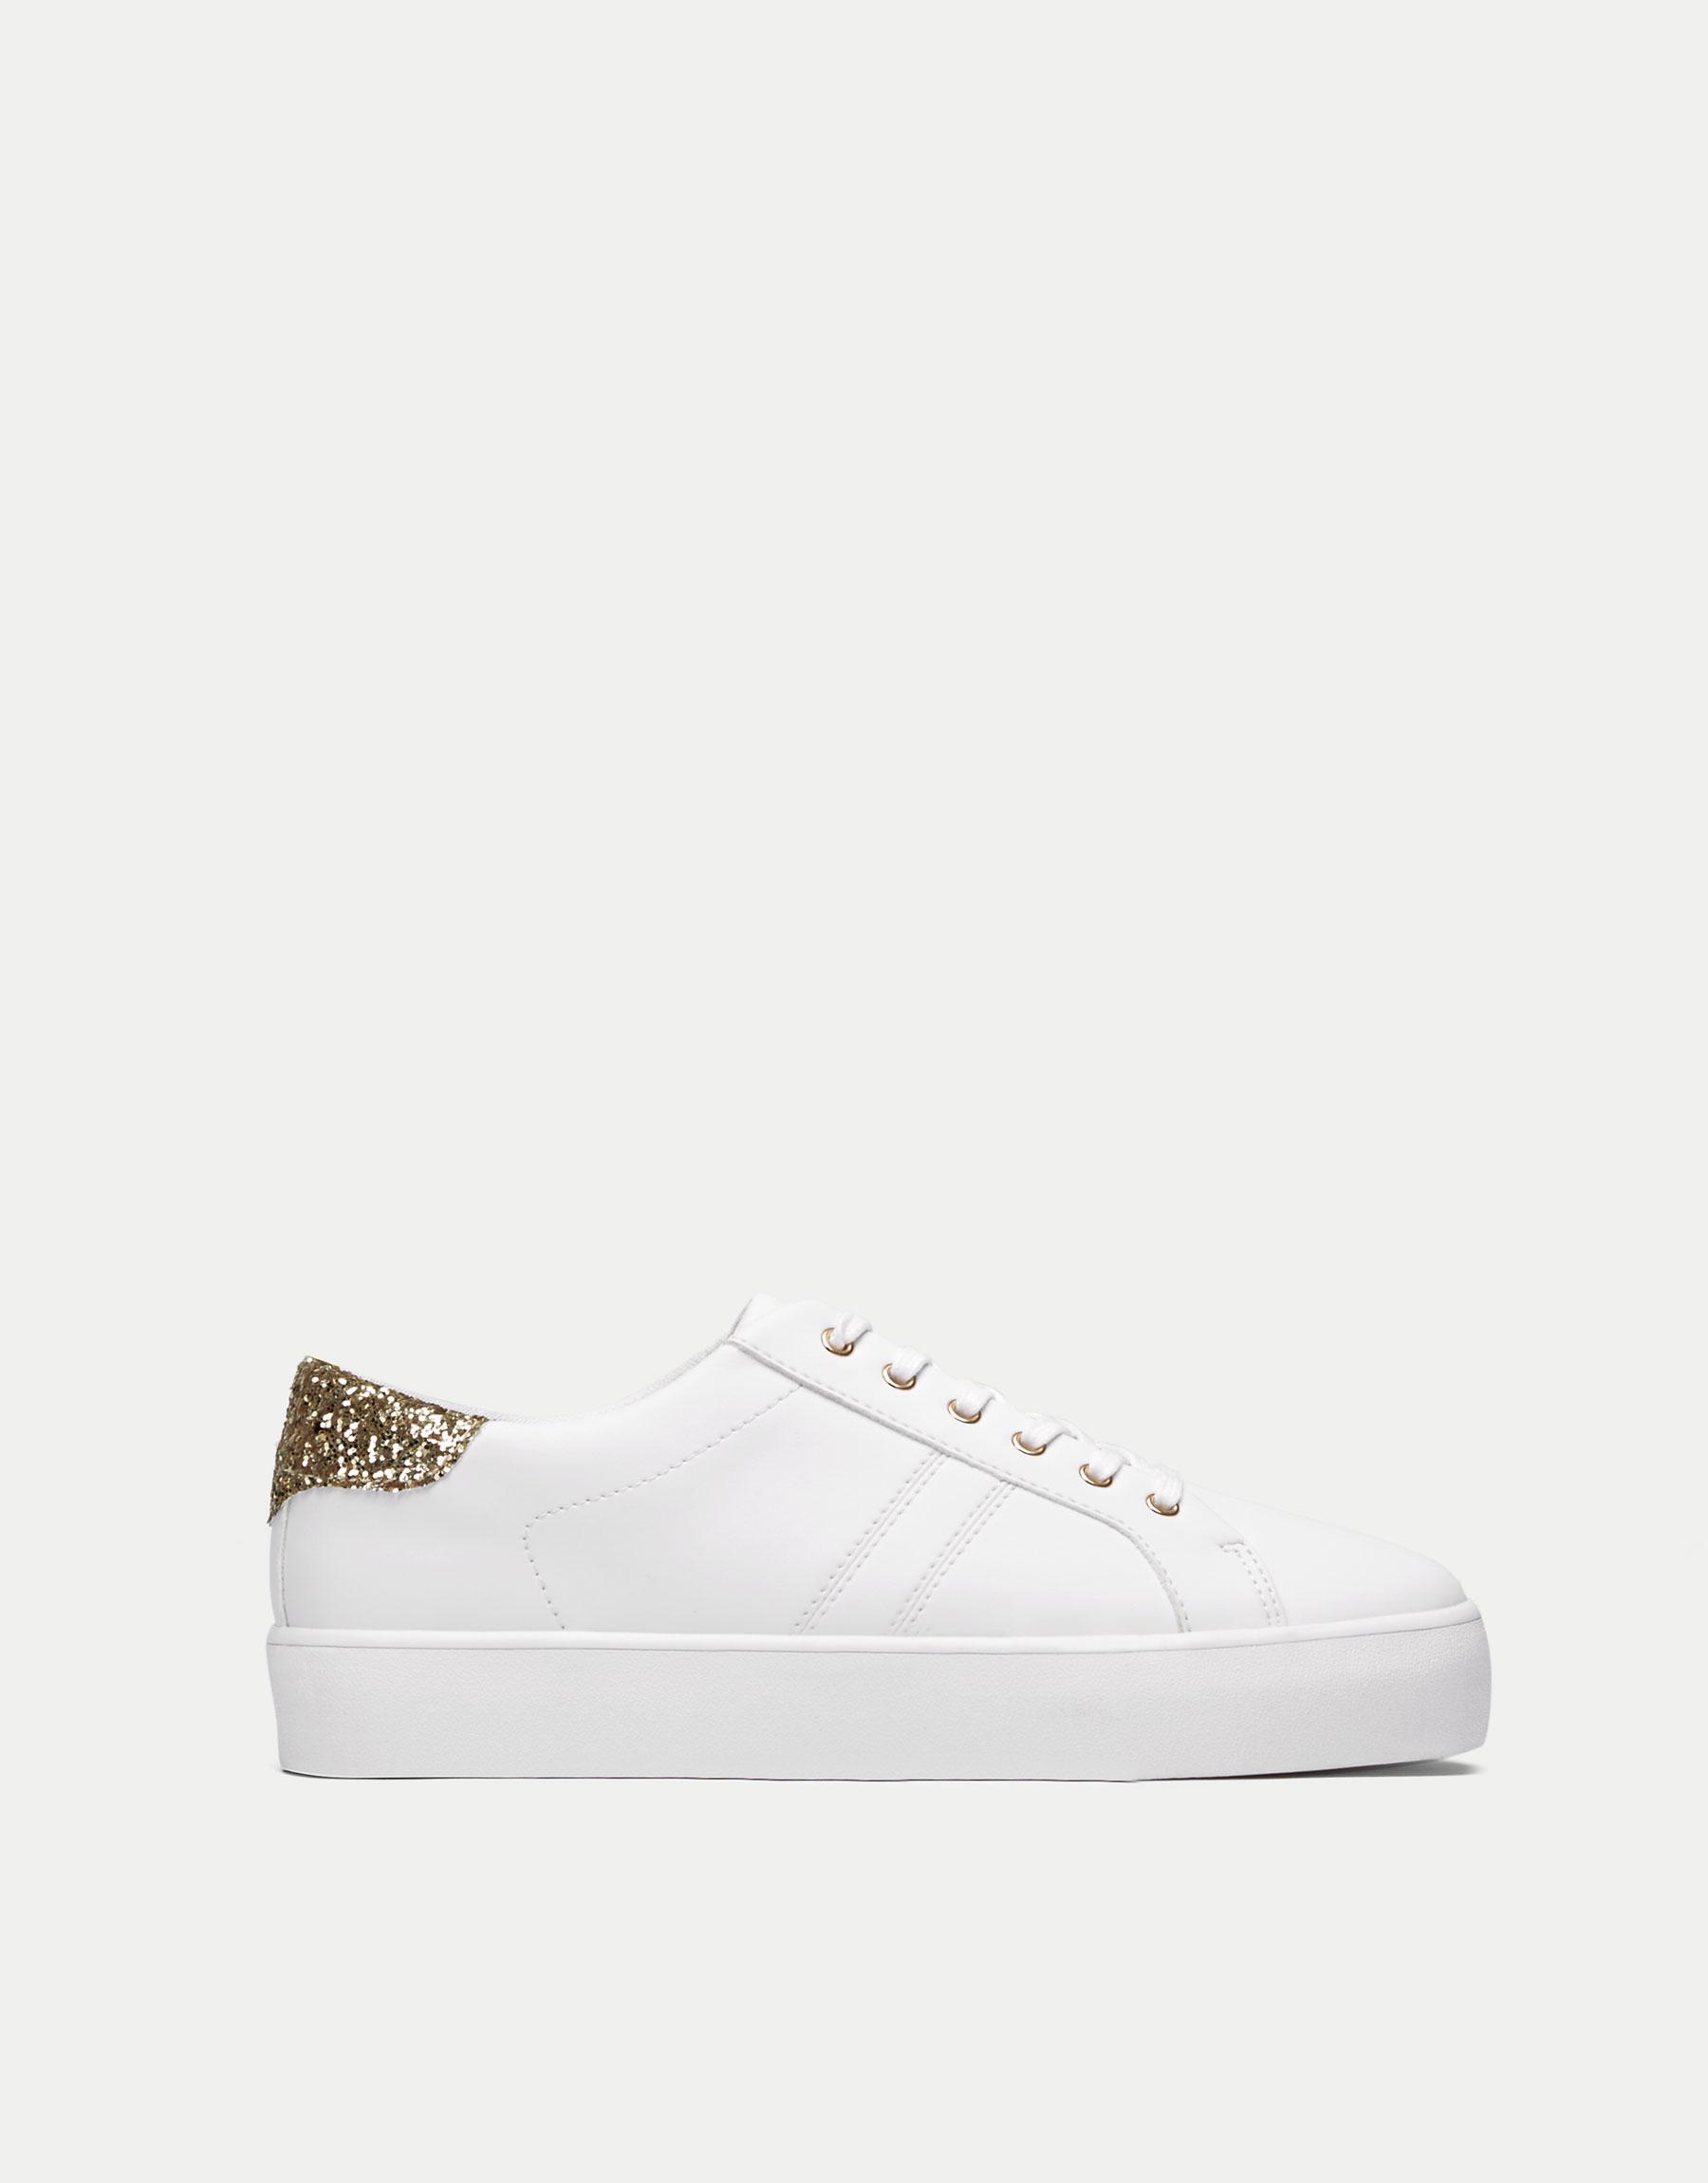 Plimsolls with glittery heel